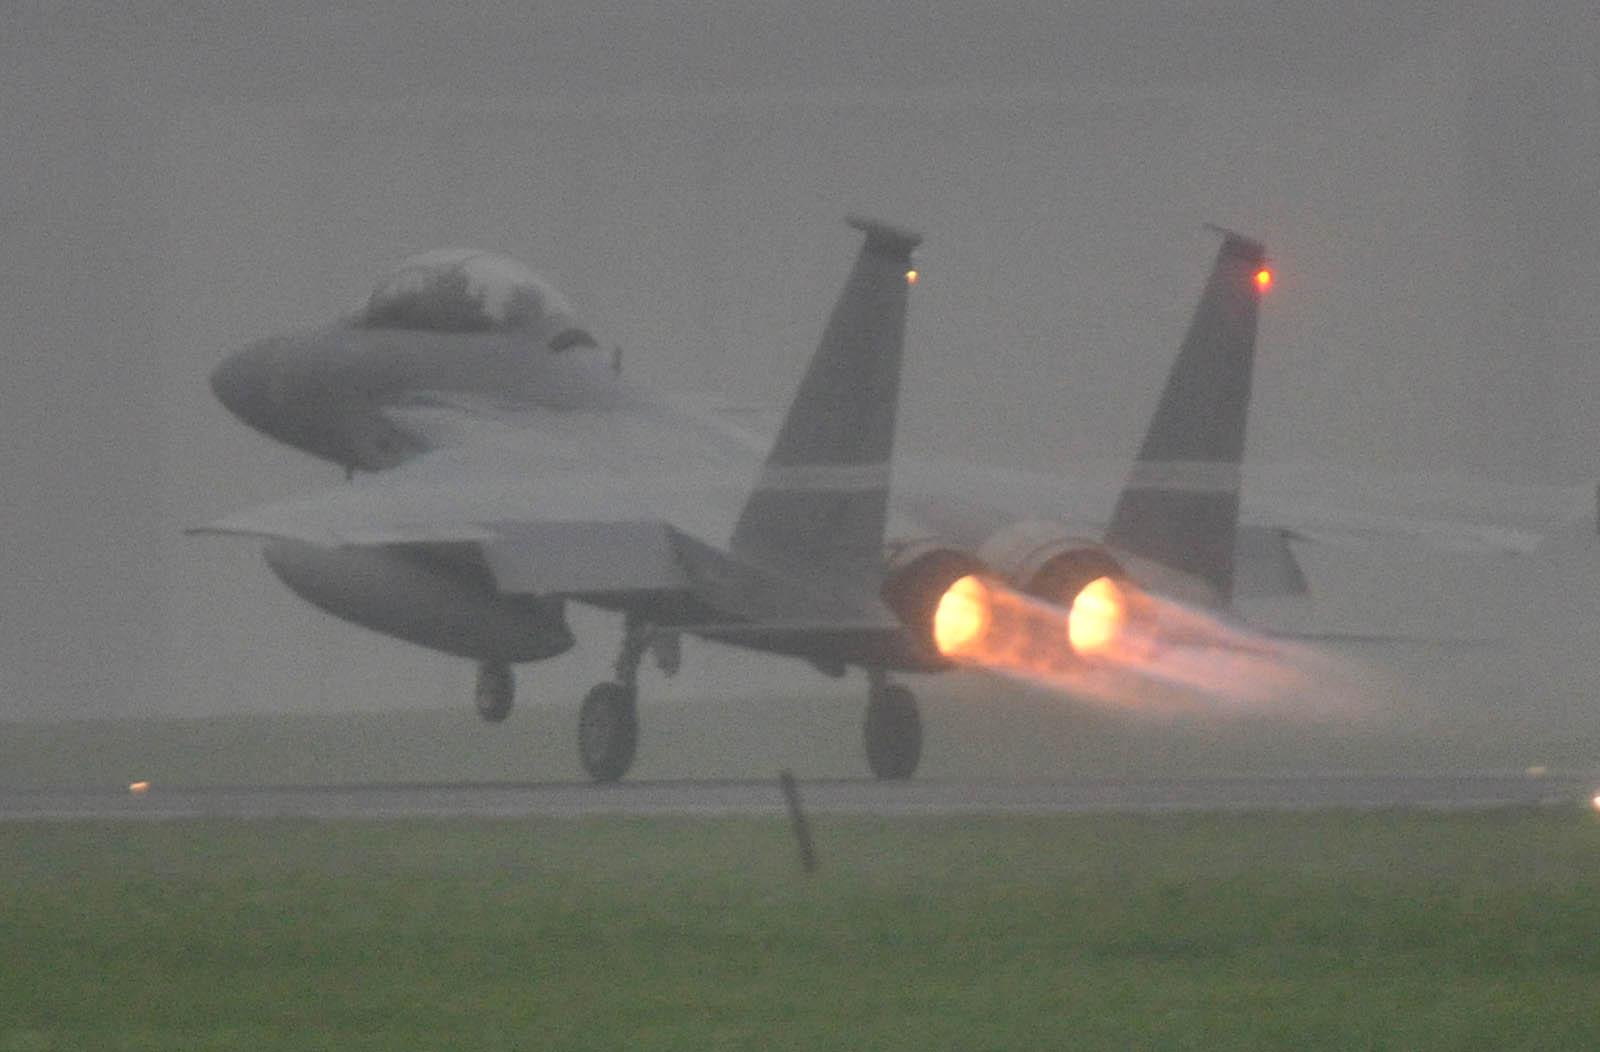 F15d120720g035